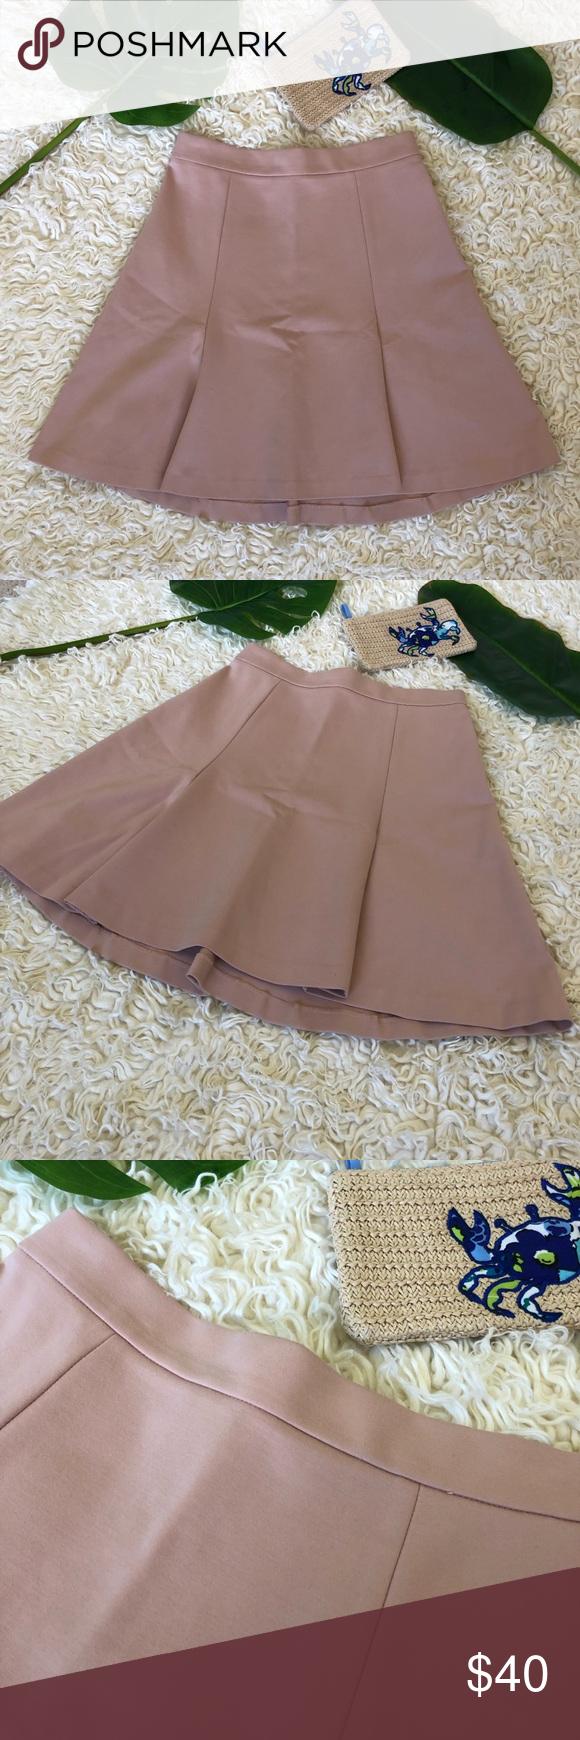 J Crew Blush Pleated A Line Skirt Chic Clothing Style Blush Skirt Fashion